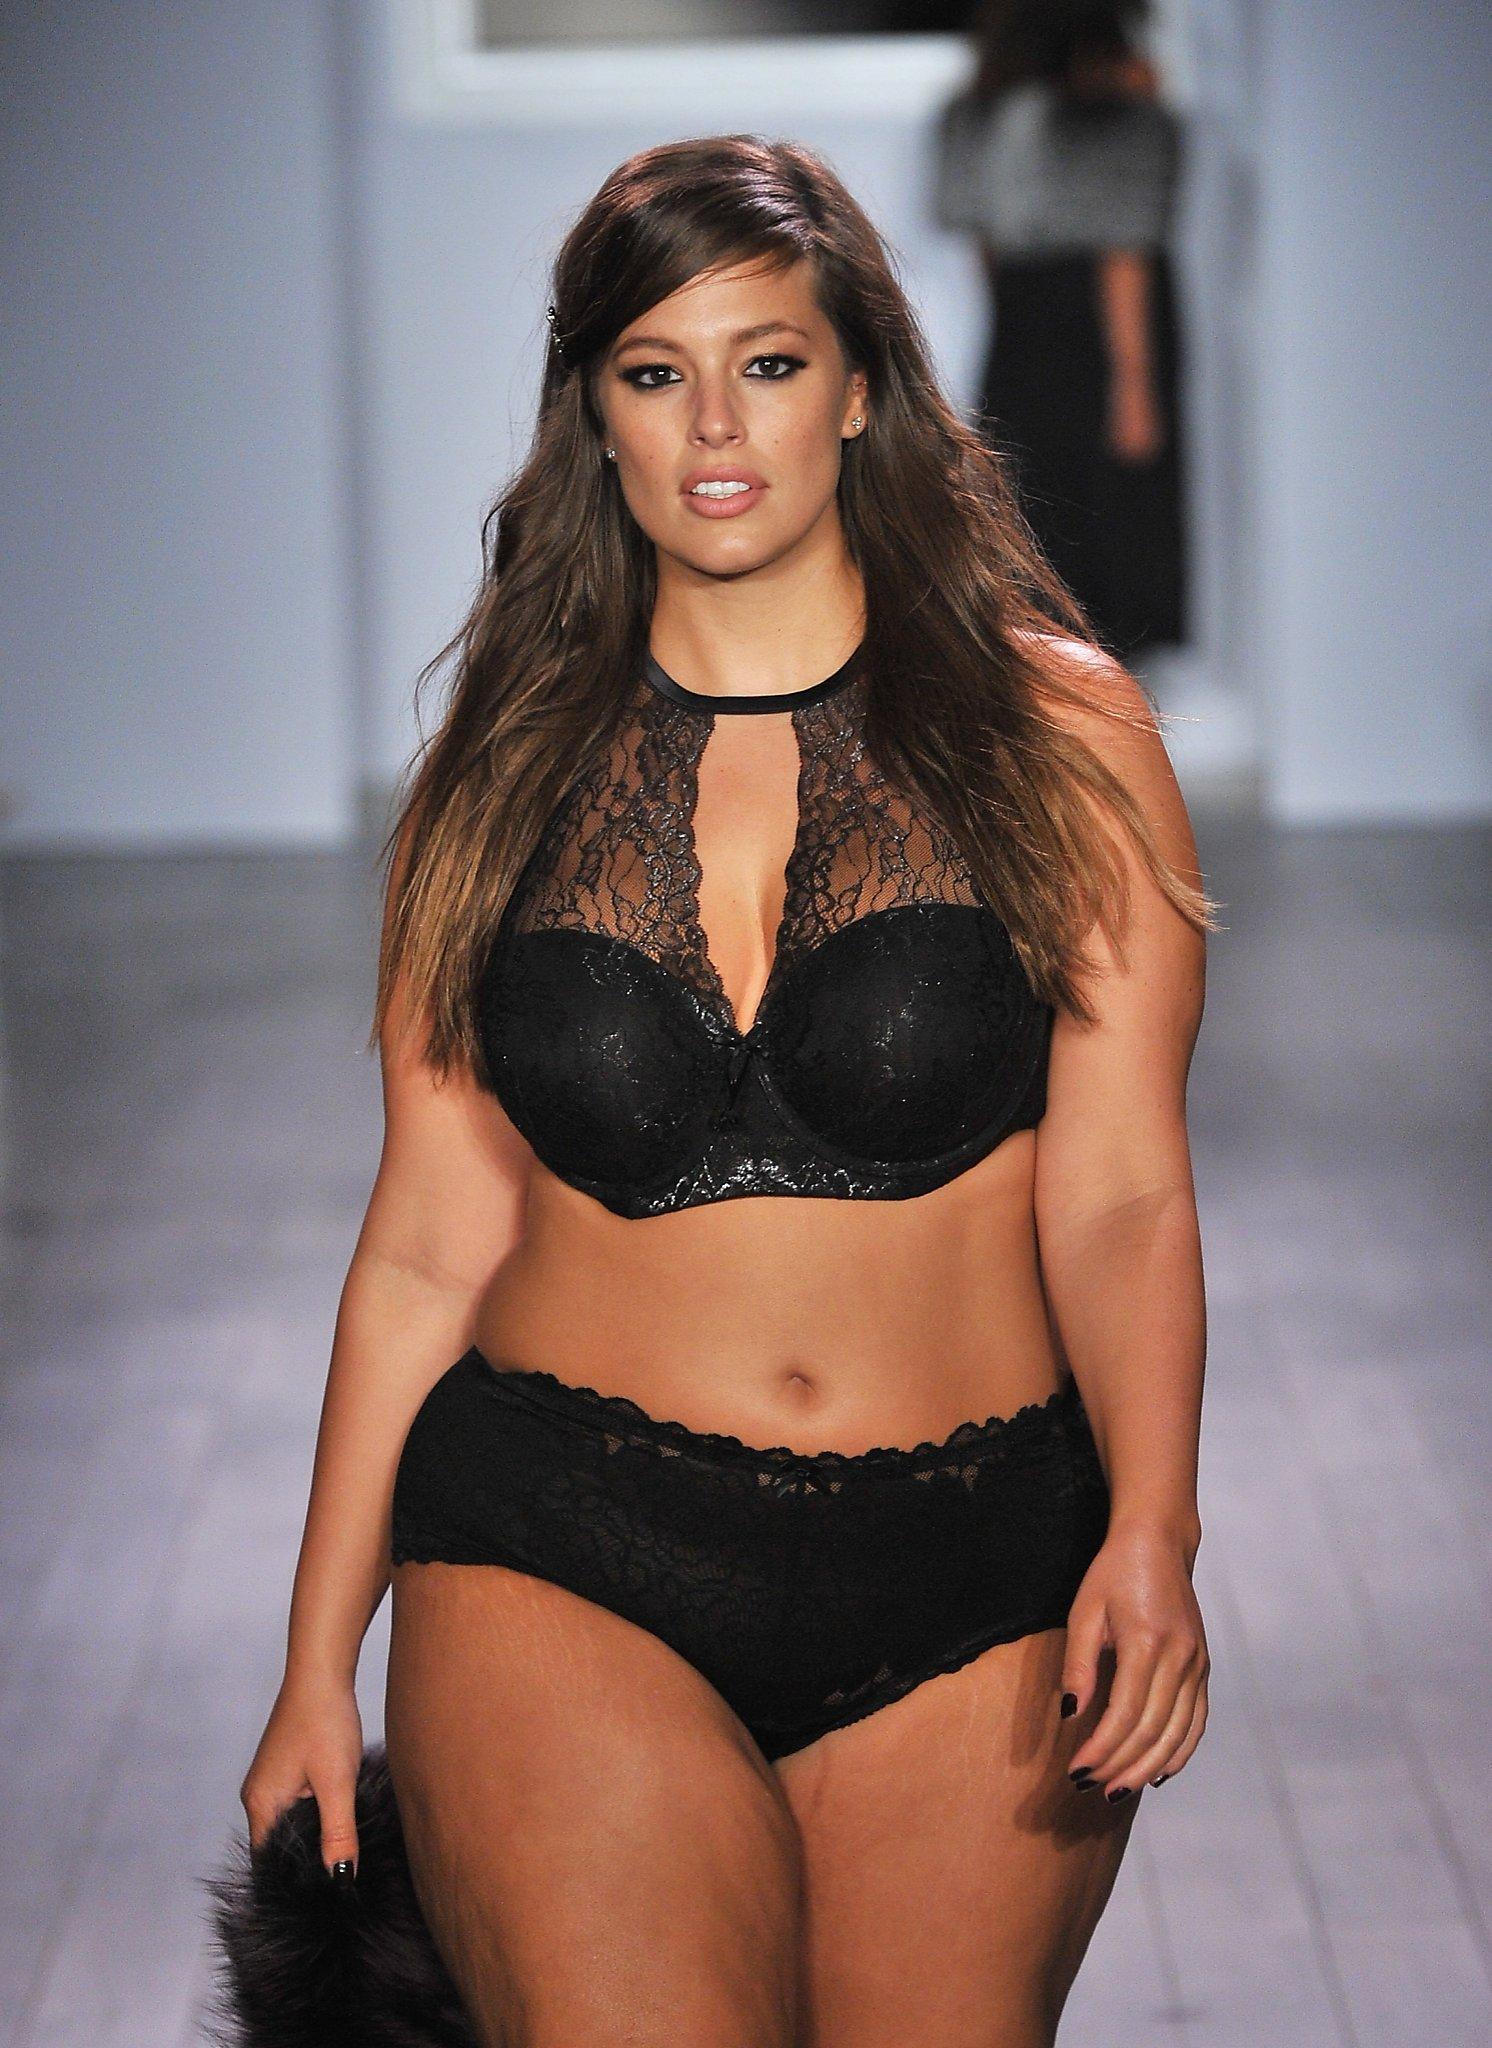 1122656318401 Plus-size model Ashley Graham debuts lingerie line at  NYFW - SFGate